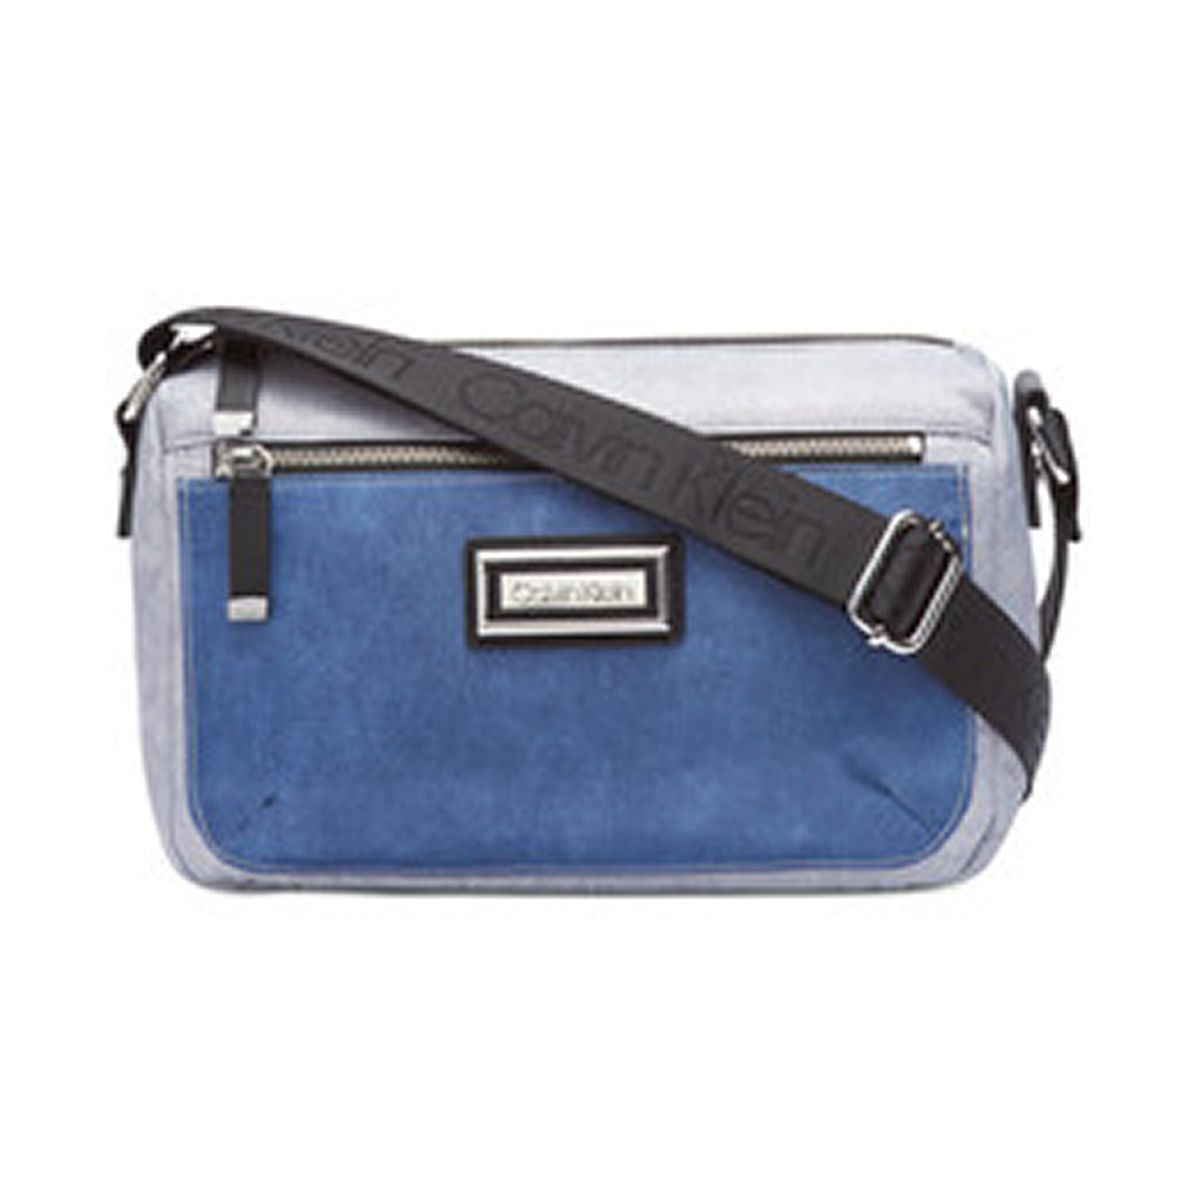 e43a10defb Calvin Klein Handbags   Bags - Macy s